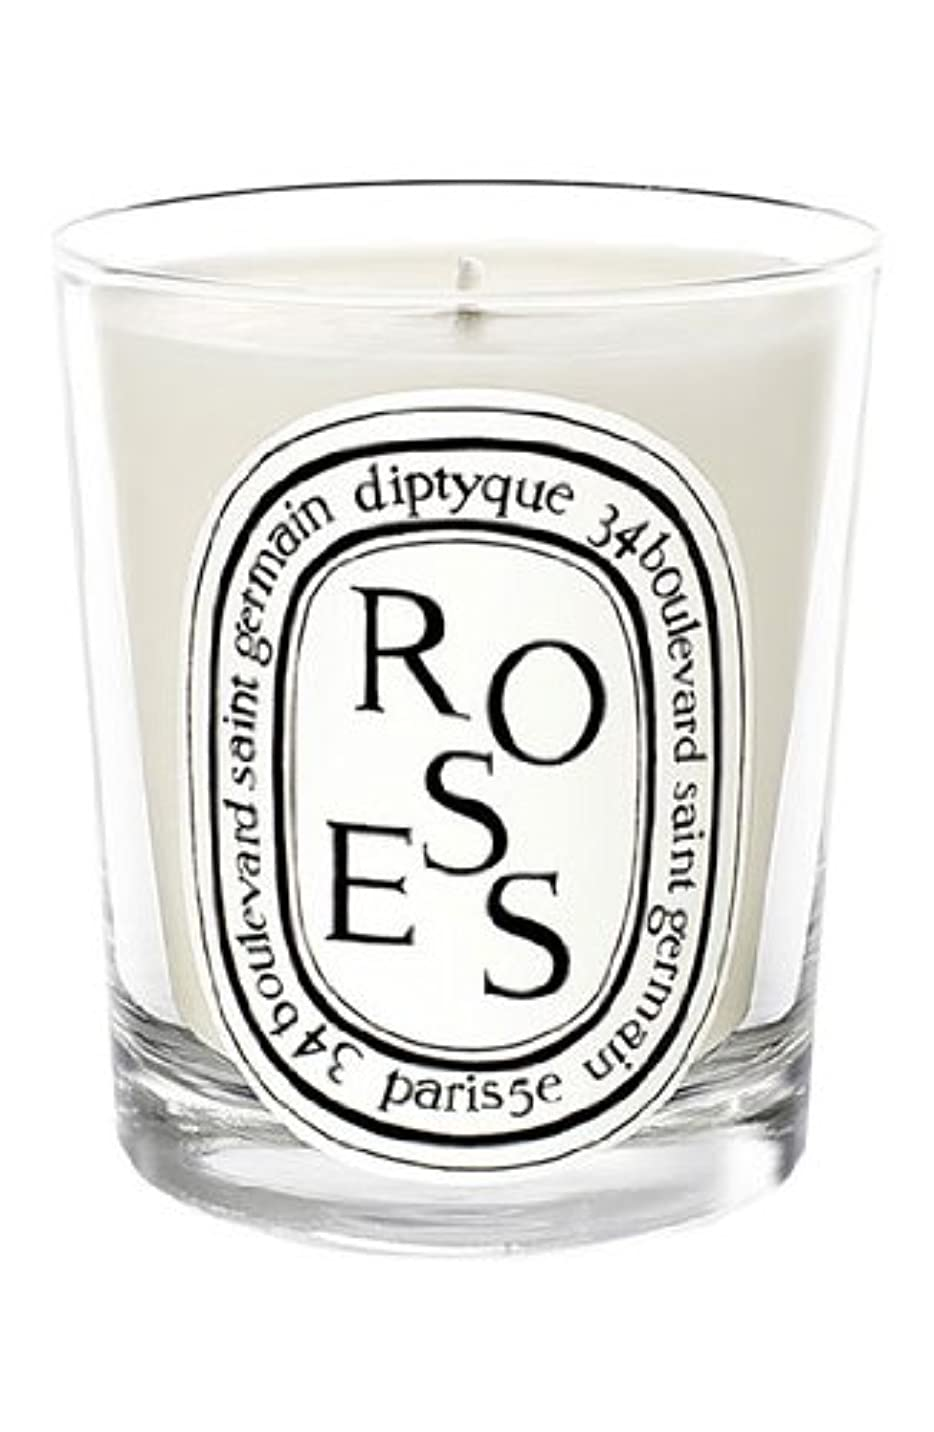 Diptyque - Roses Candle (ディプティック ロージーズ キャンドル) 70 g